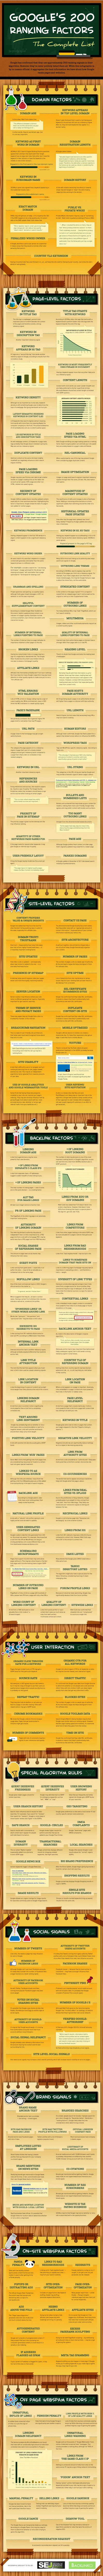 200-Ranking-Factors-Infographic